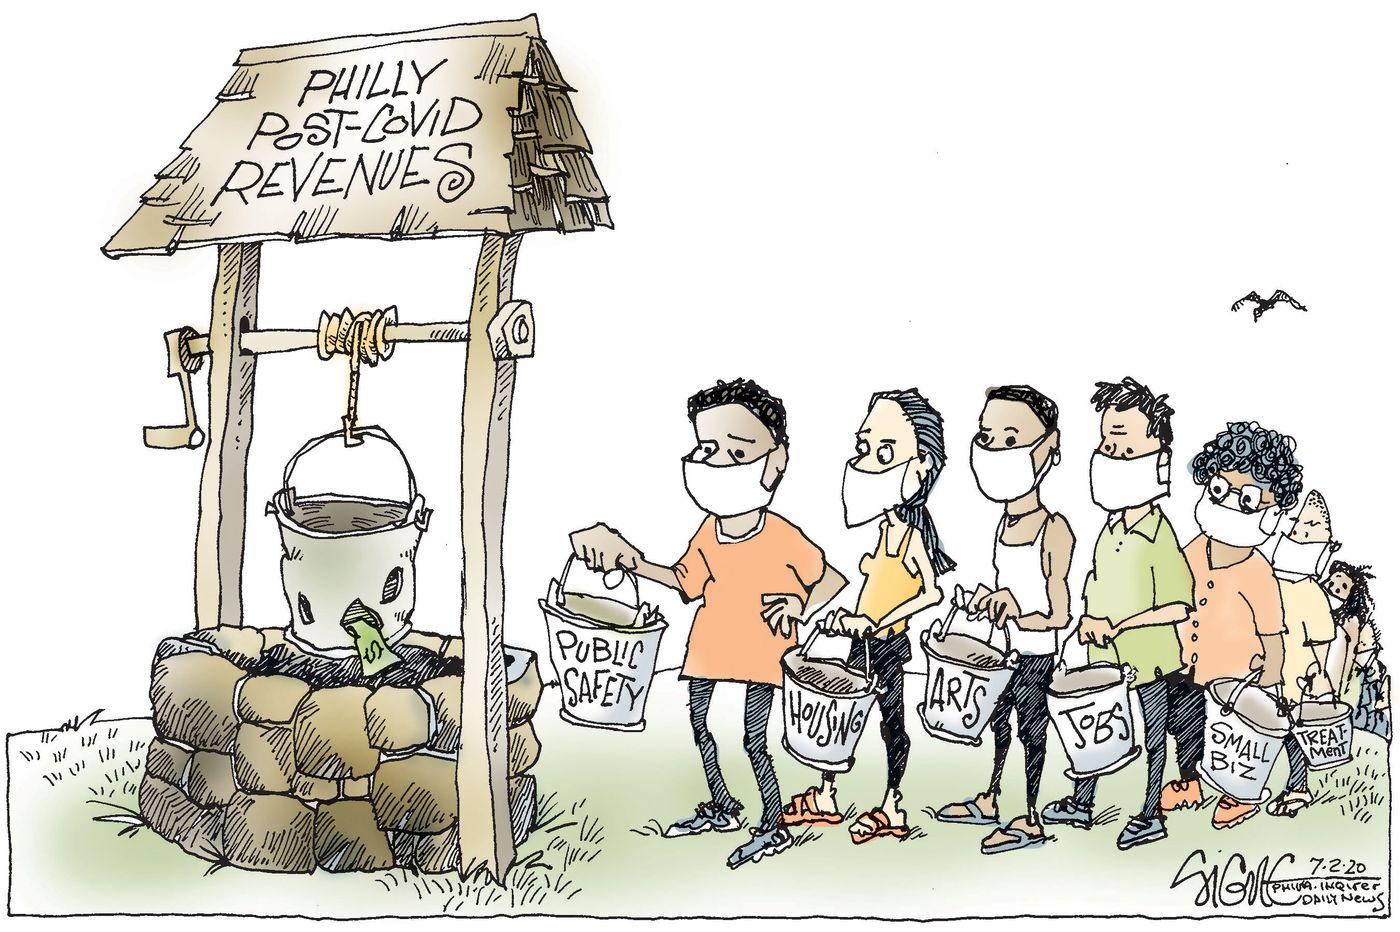 Political Cartoon: The bucket list for Philadelphia's budget